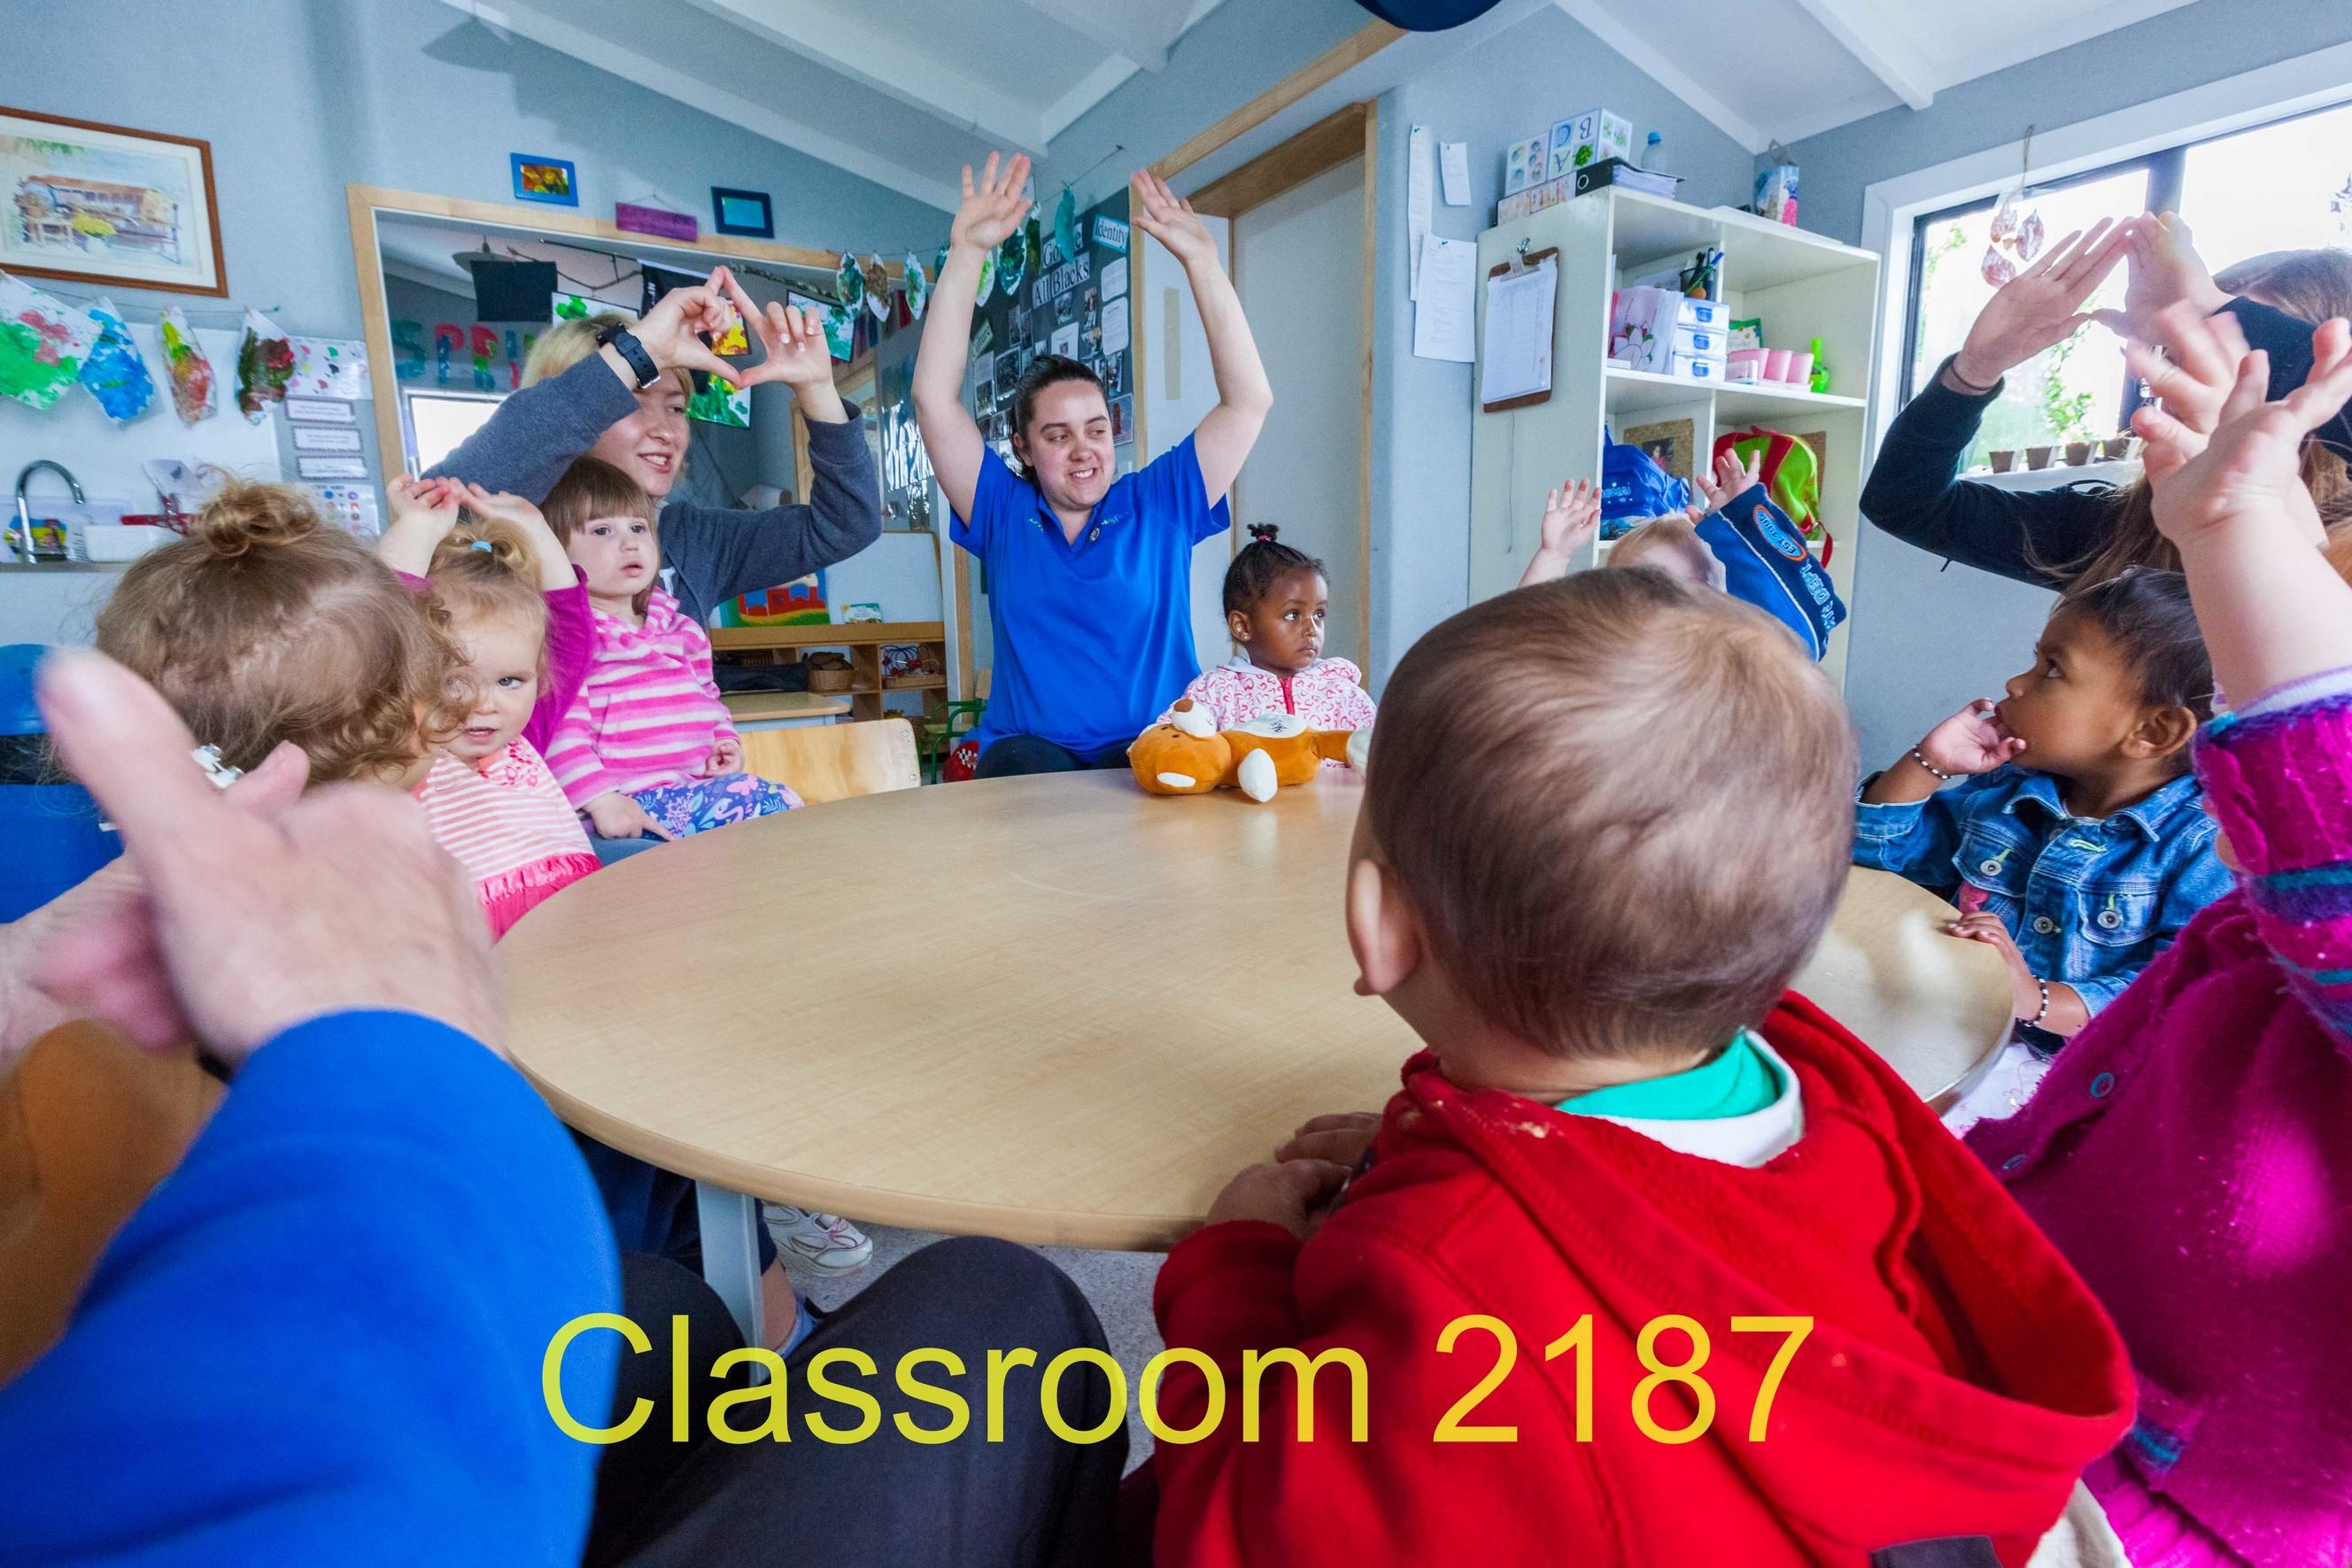 Classroom 2187